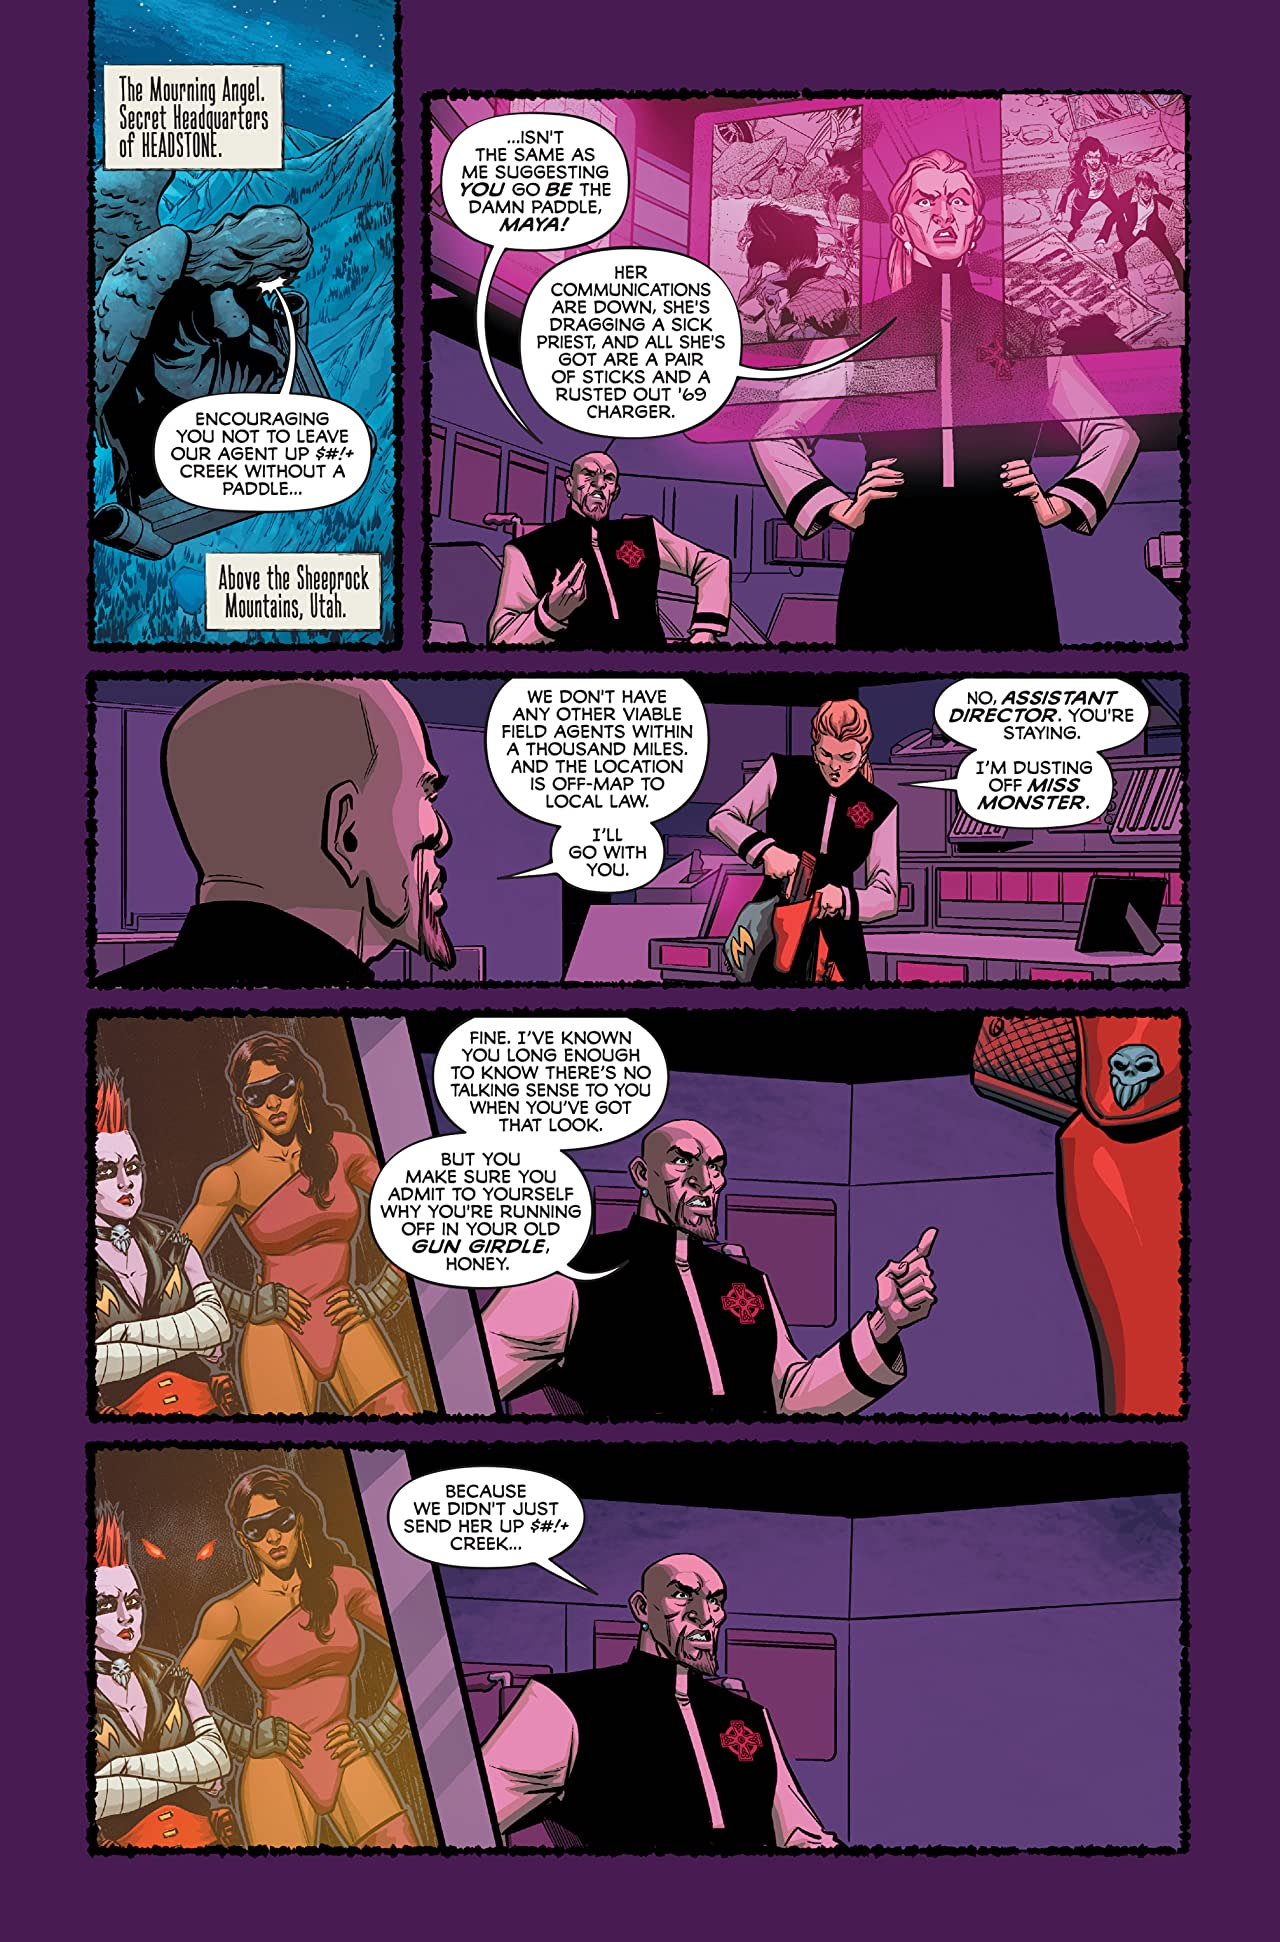 Grave Danger (comiXology Originals) #3 (of 5)